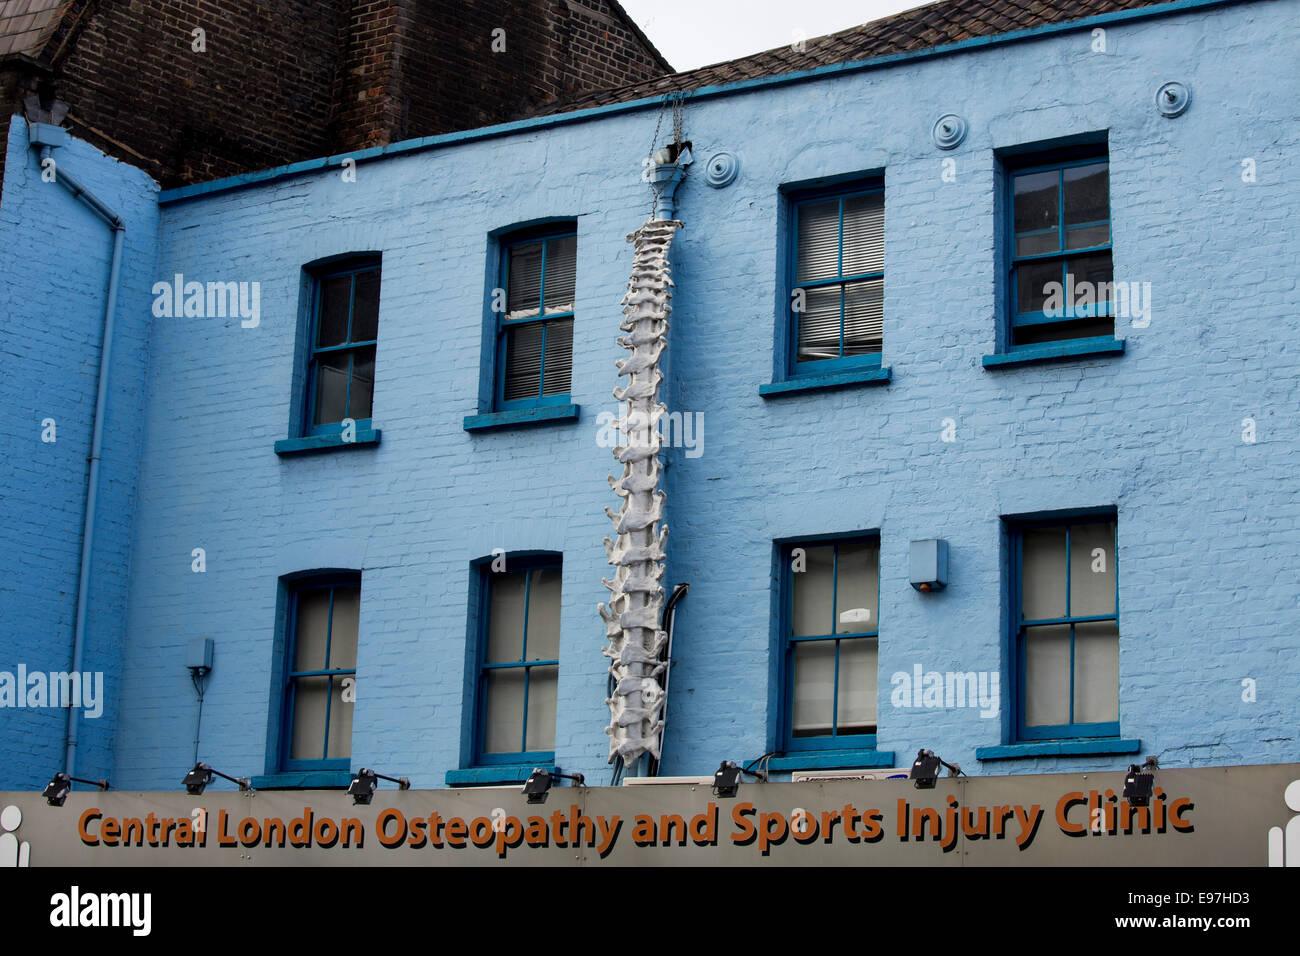 osteopahty backbone drainpipe weird shop amazing - Stock Image